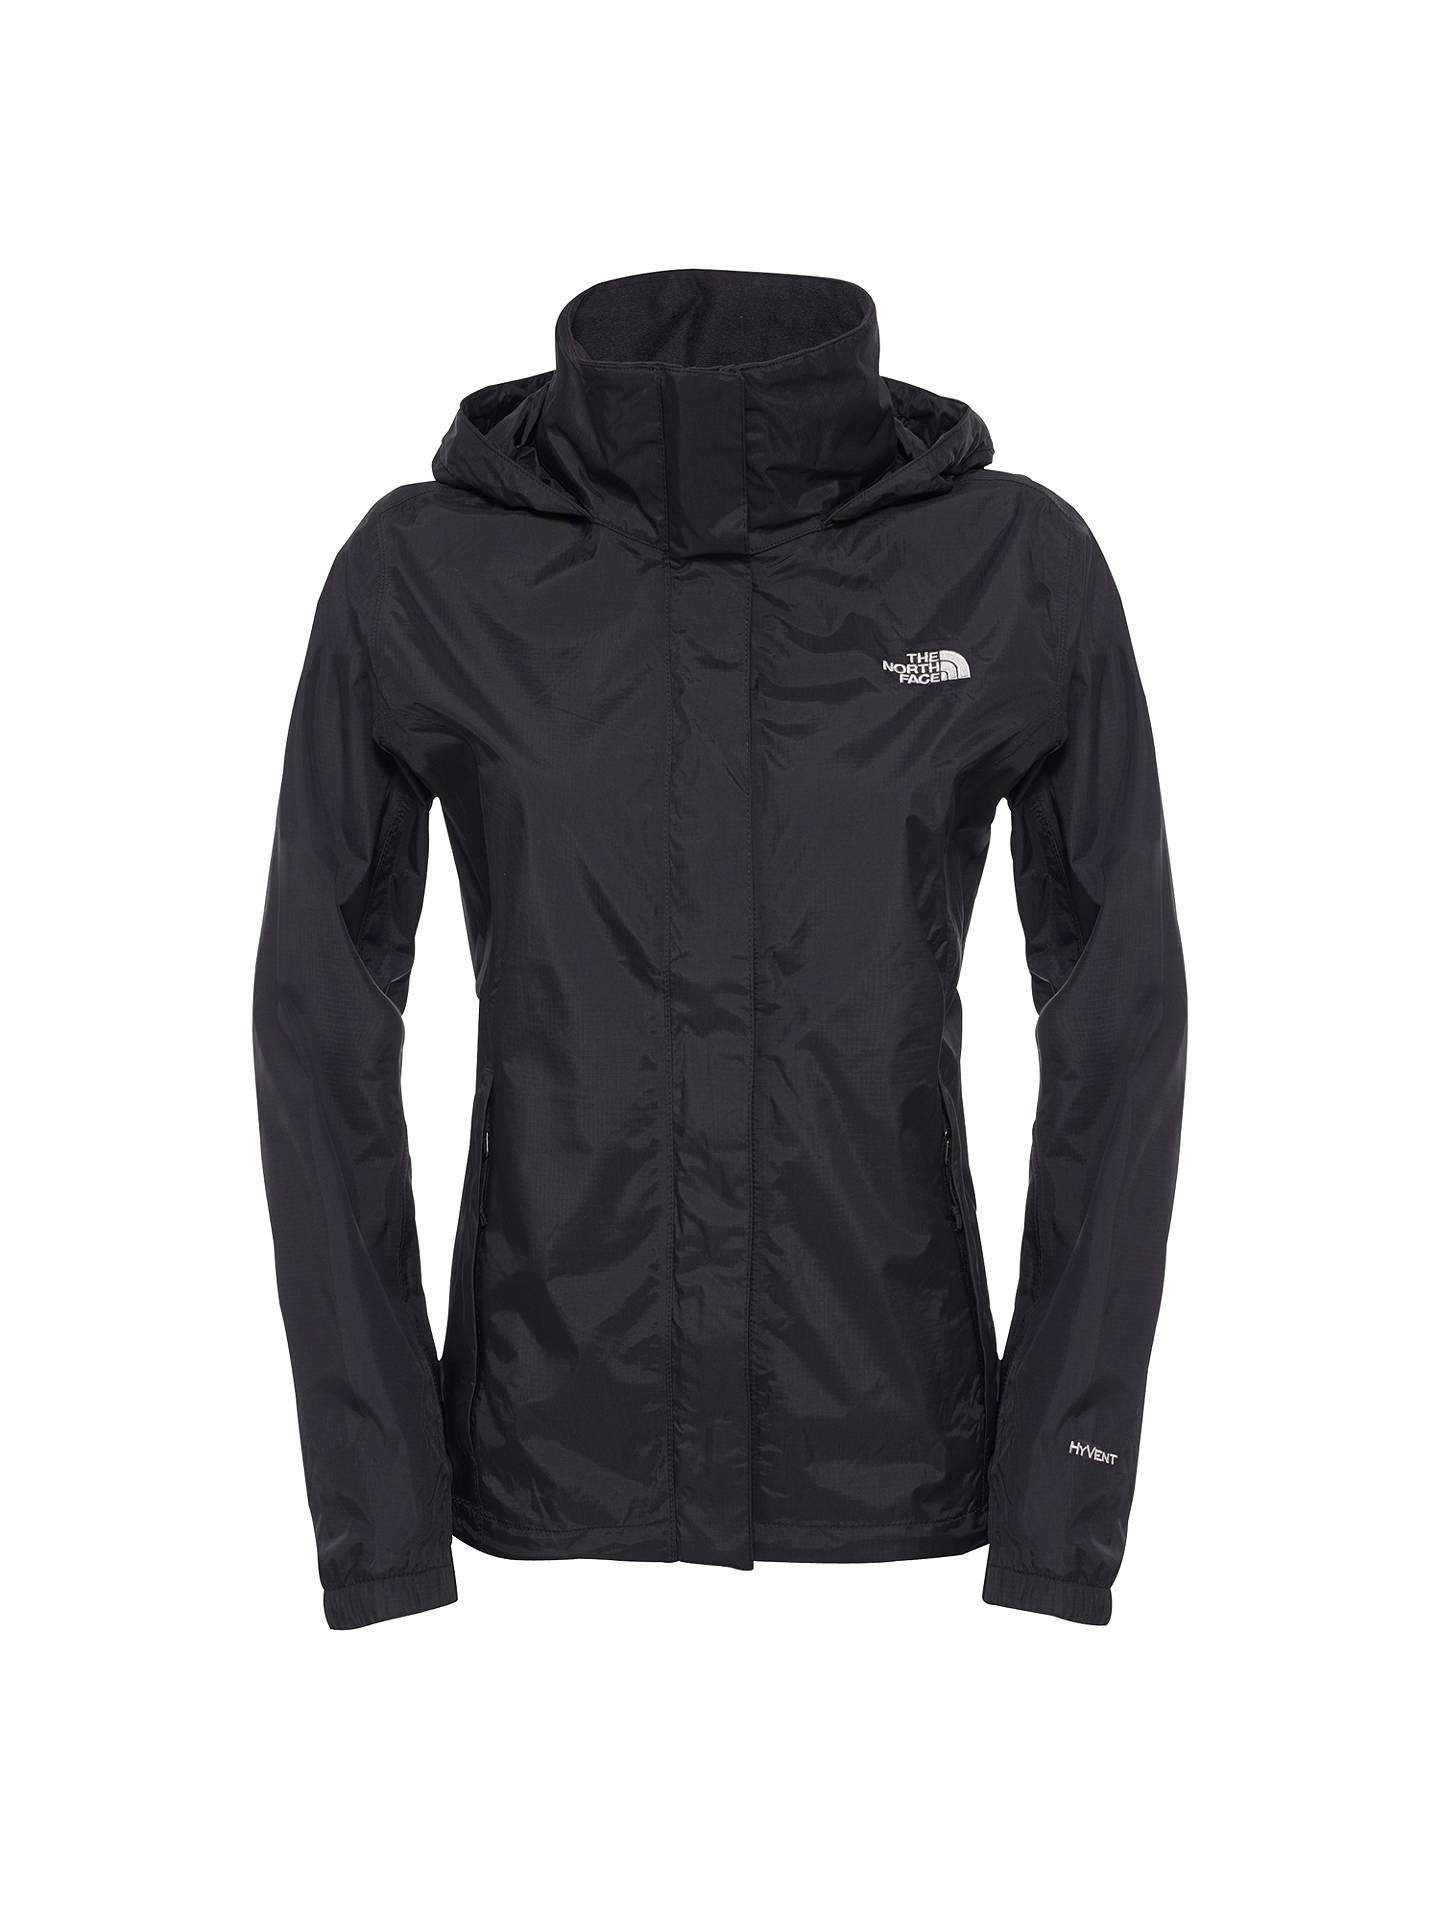 2a84e0b36 The North Face Resolve Waterproof Women's Jacket, Black at John ...